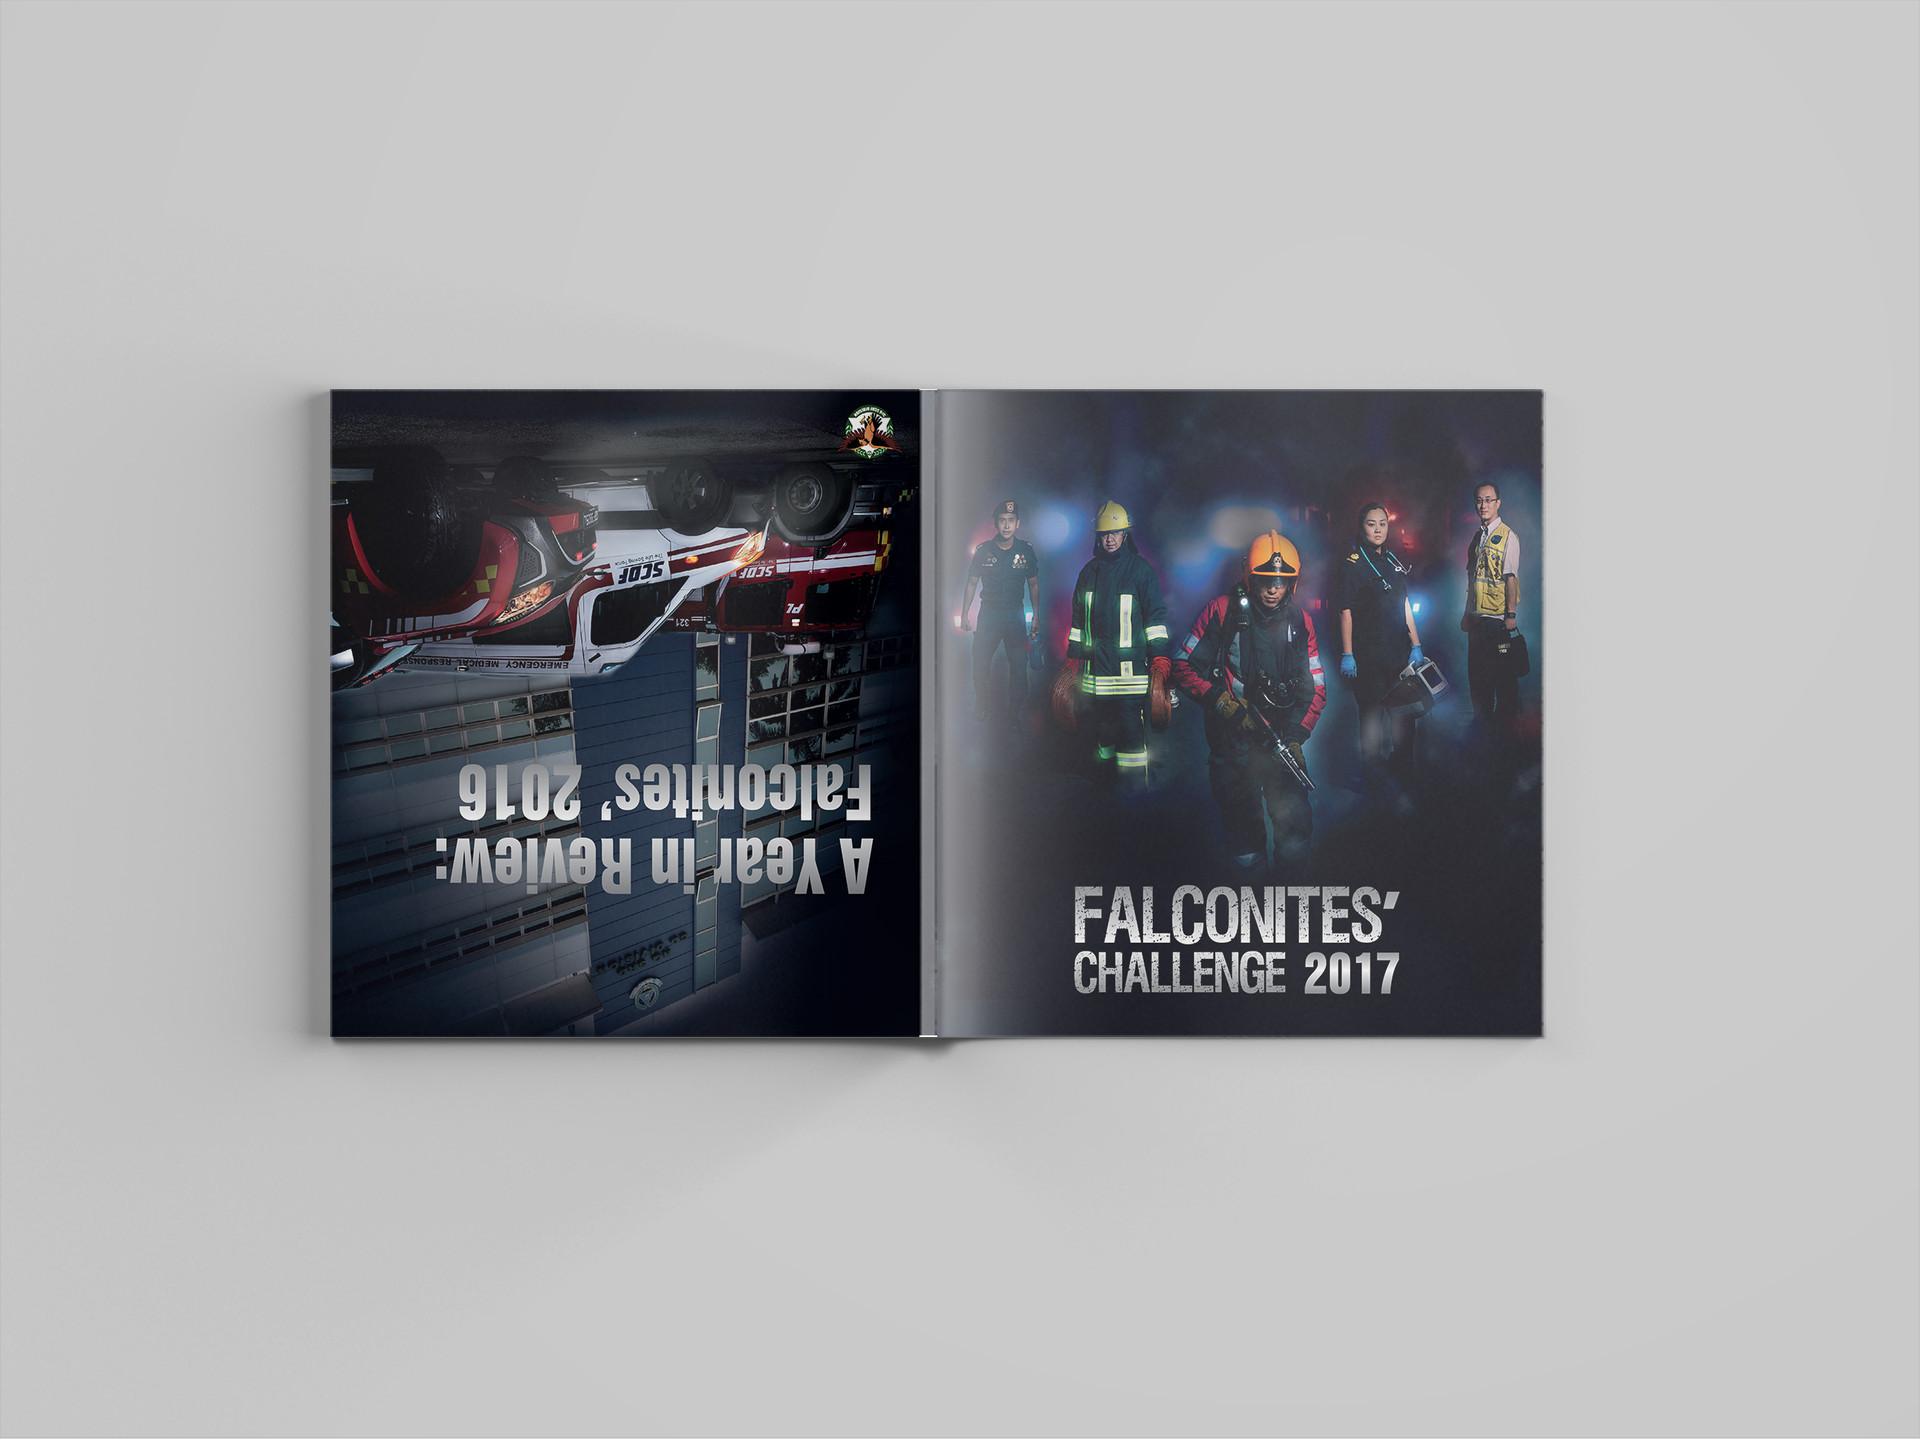 SCDF Faconite's Challenge Book Cover.jpg